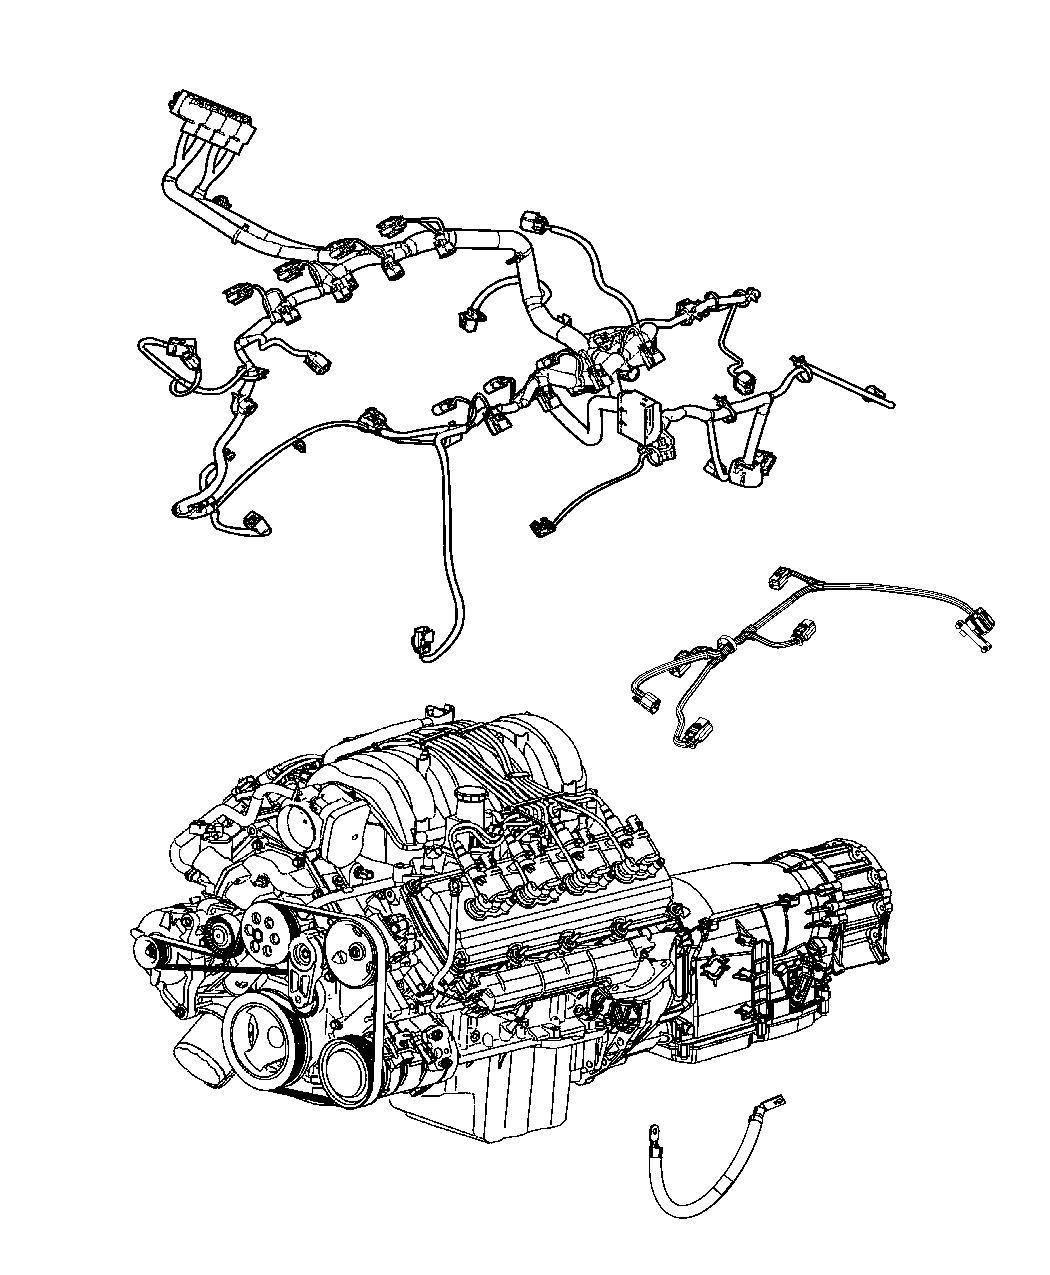 Jeep Grand Cherokee Wiring. Engine. Gas, powertrain, mopar